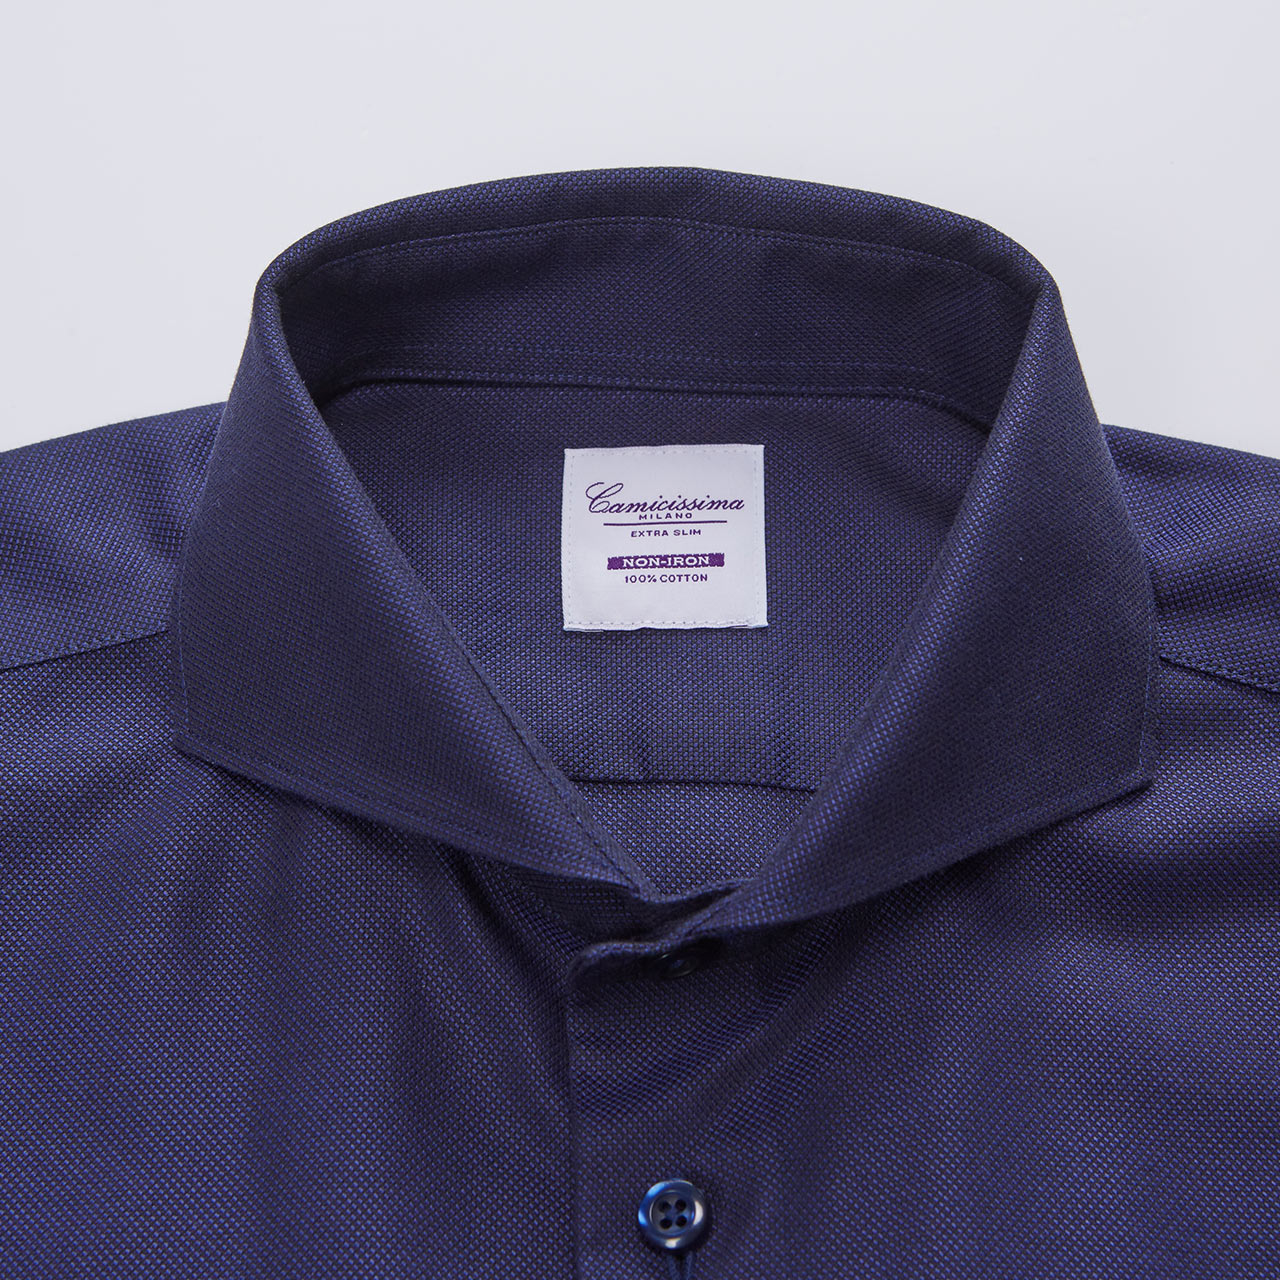 CAMICISSIMA/恺米切秋新款男士修身免烫长袖衬衫纯棉商务蓝色衬衣